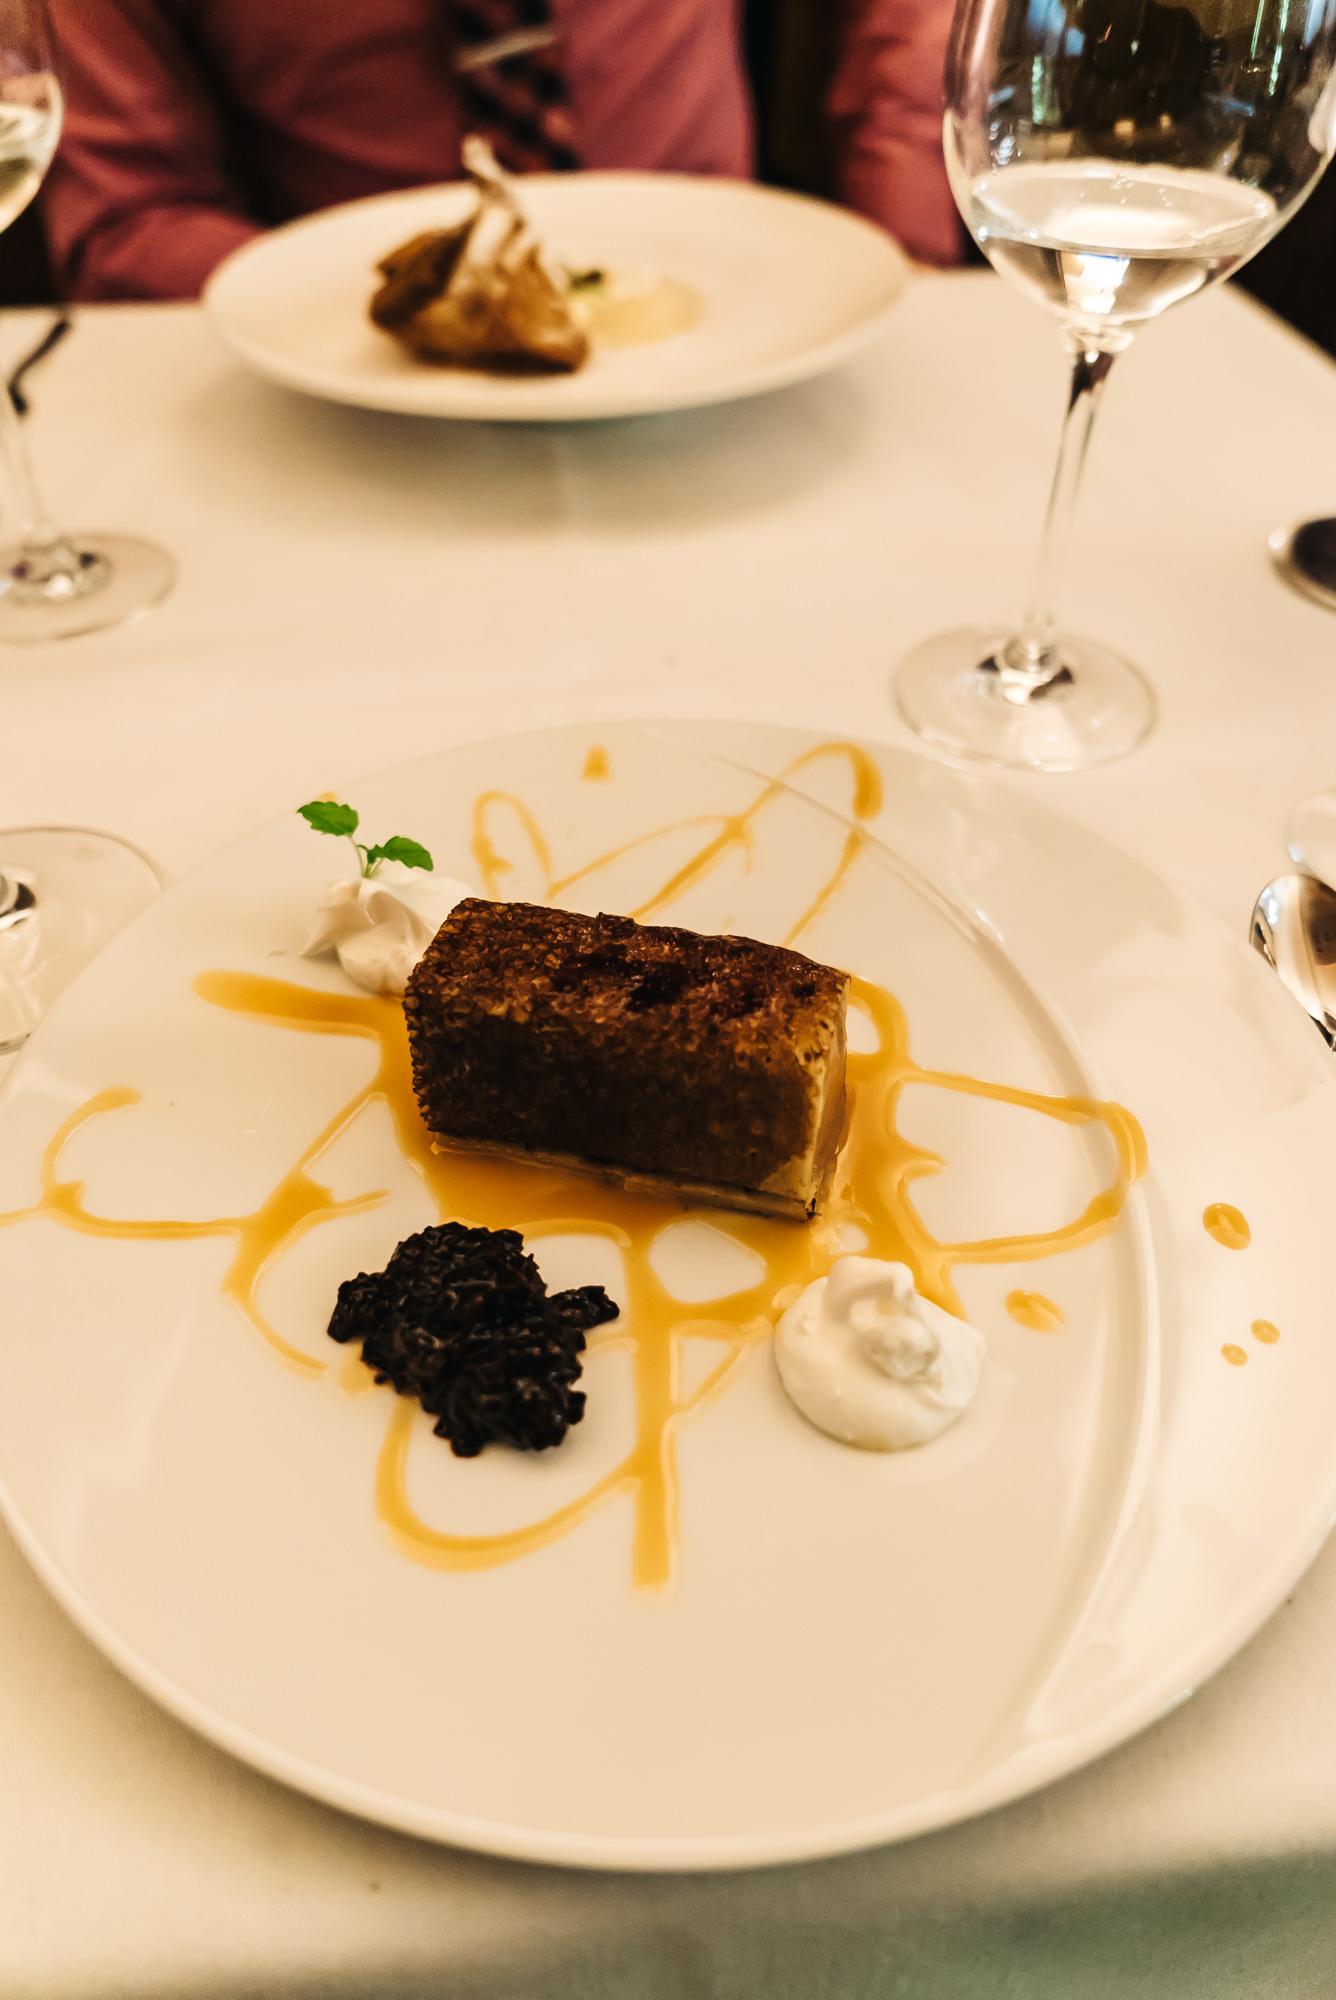 Beautiful chocolate dessert